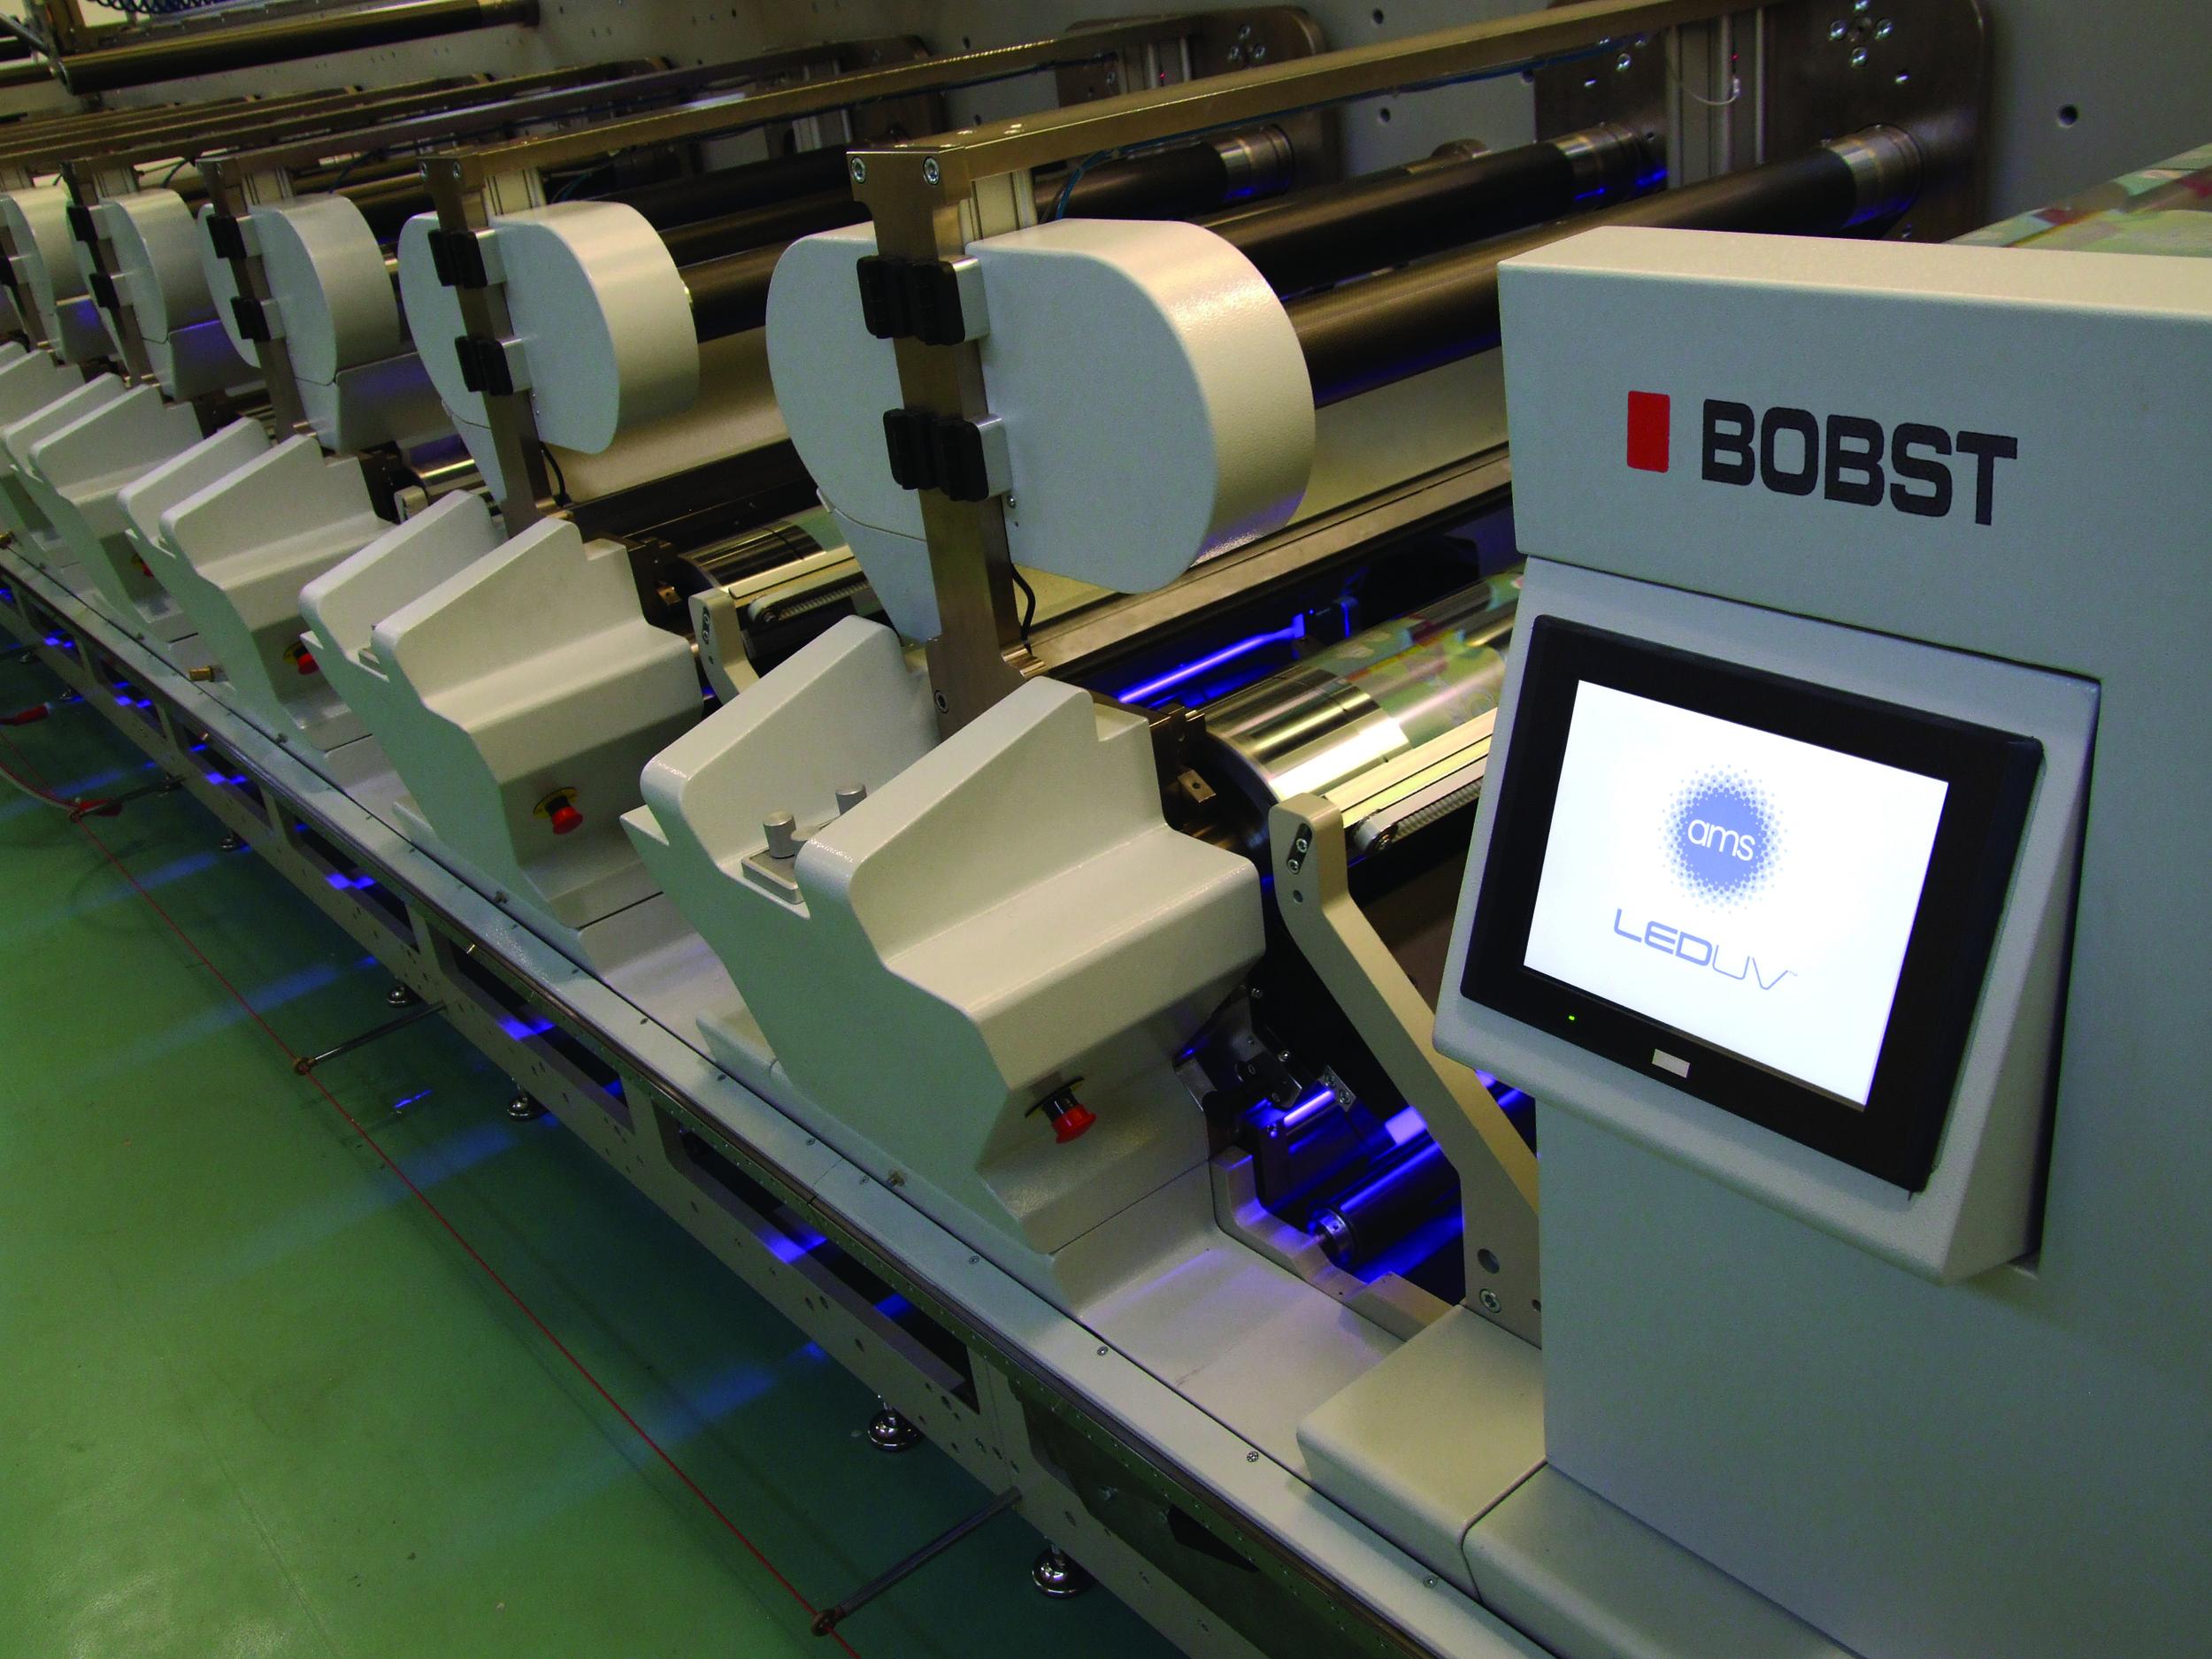 Color printing bobst - New Bobst M5 Ams For Narrow Web Flexo Led Uv Pioneer